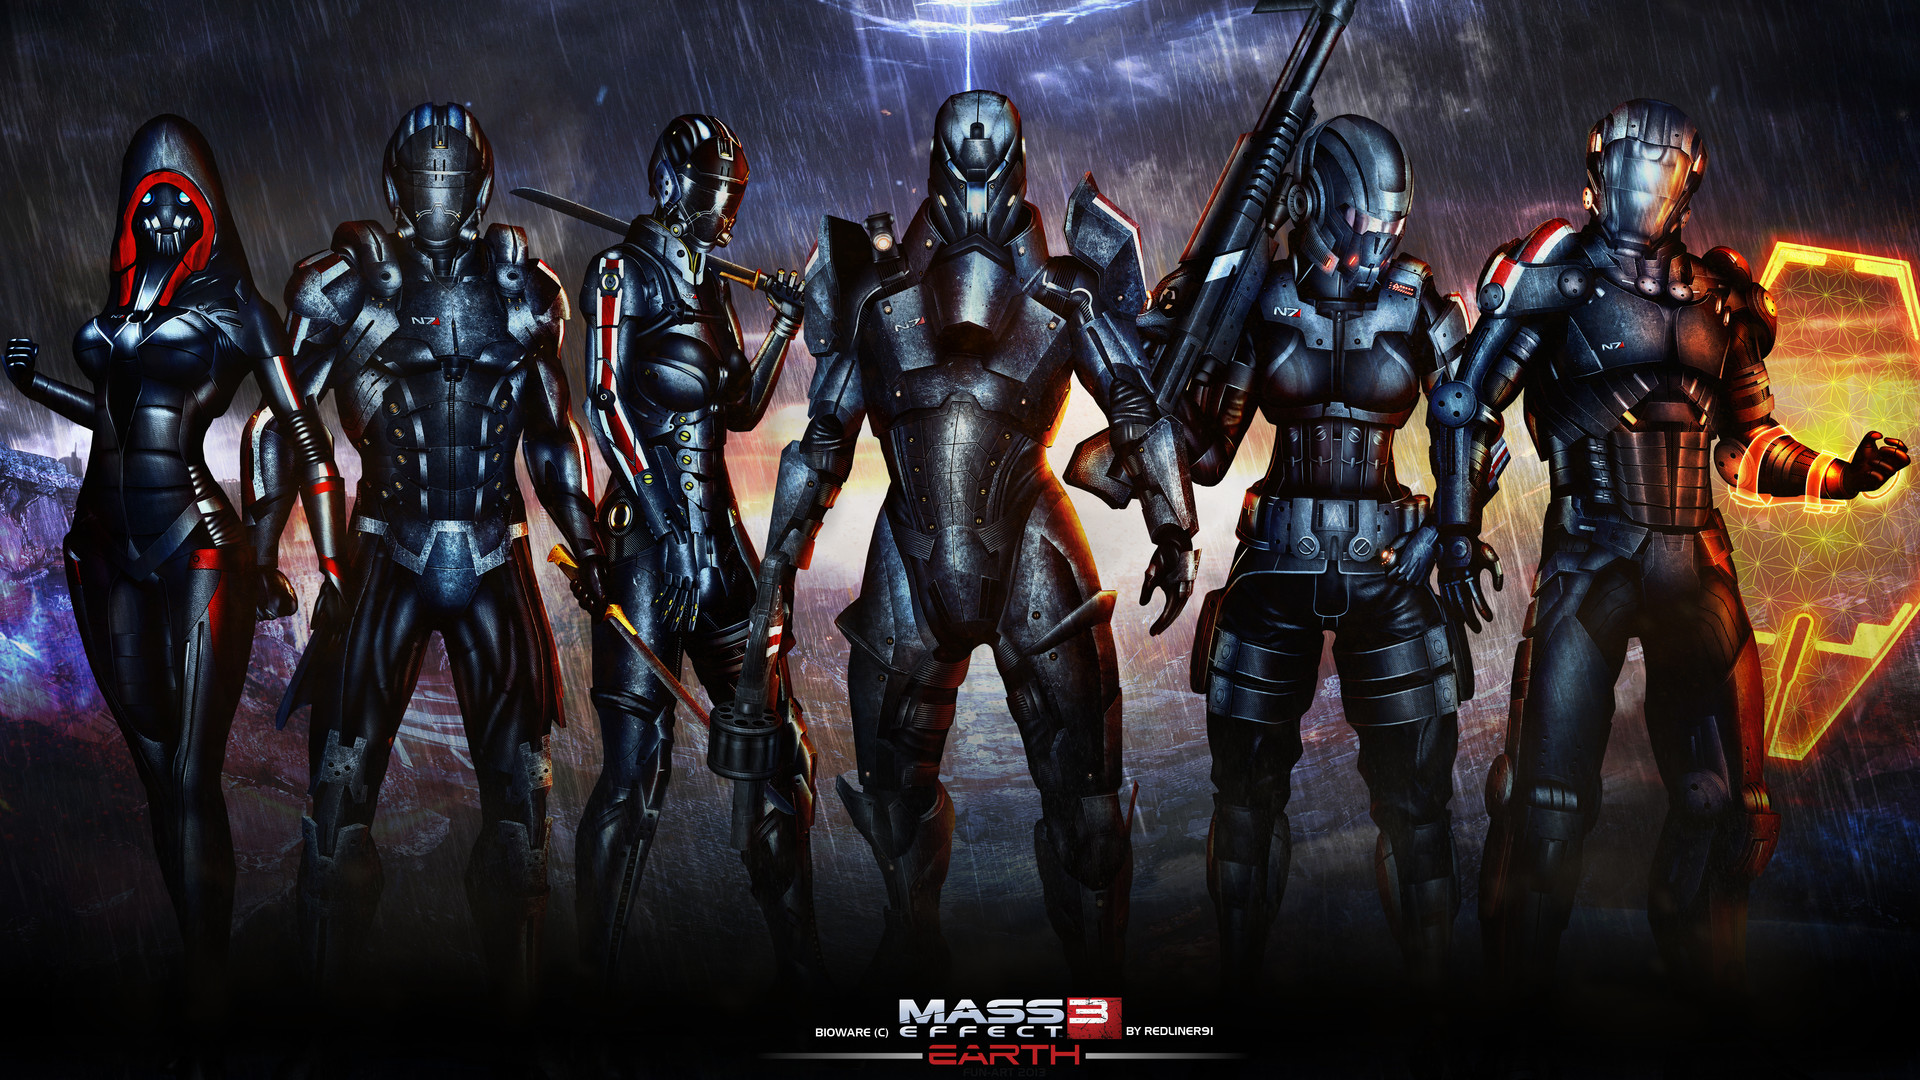 ArtStation-Earth-DLC-Mass-Effect-Alexander-Krasnov-wallpaper-wpc5802263